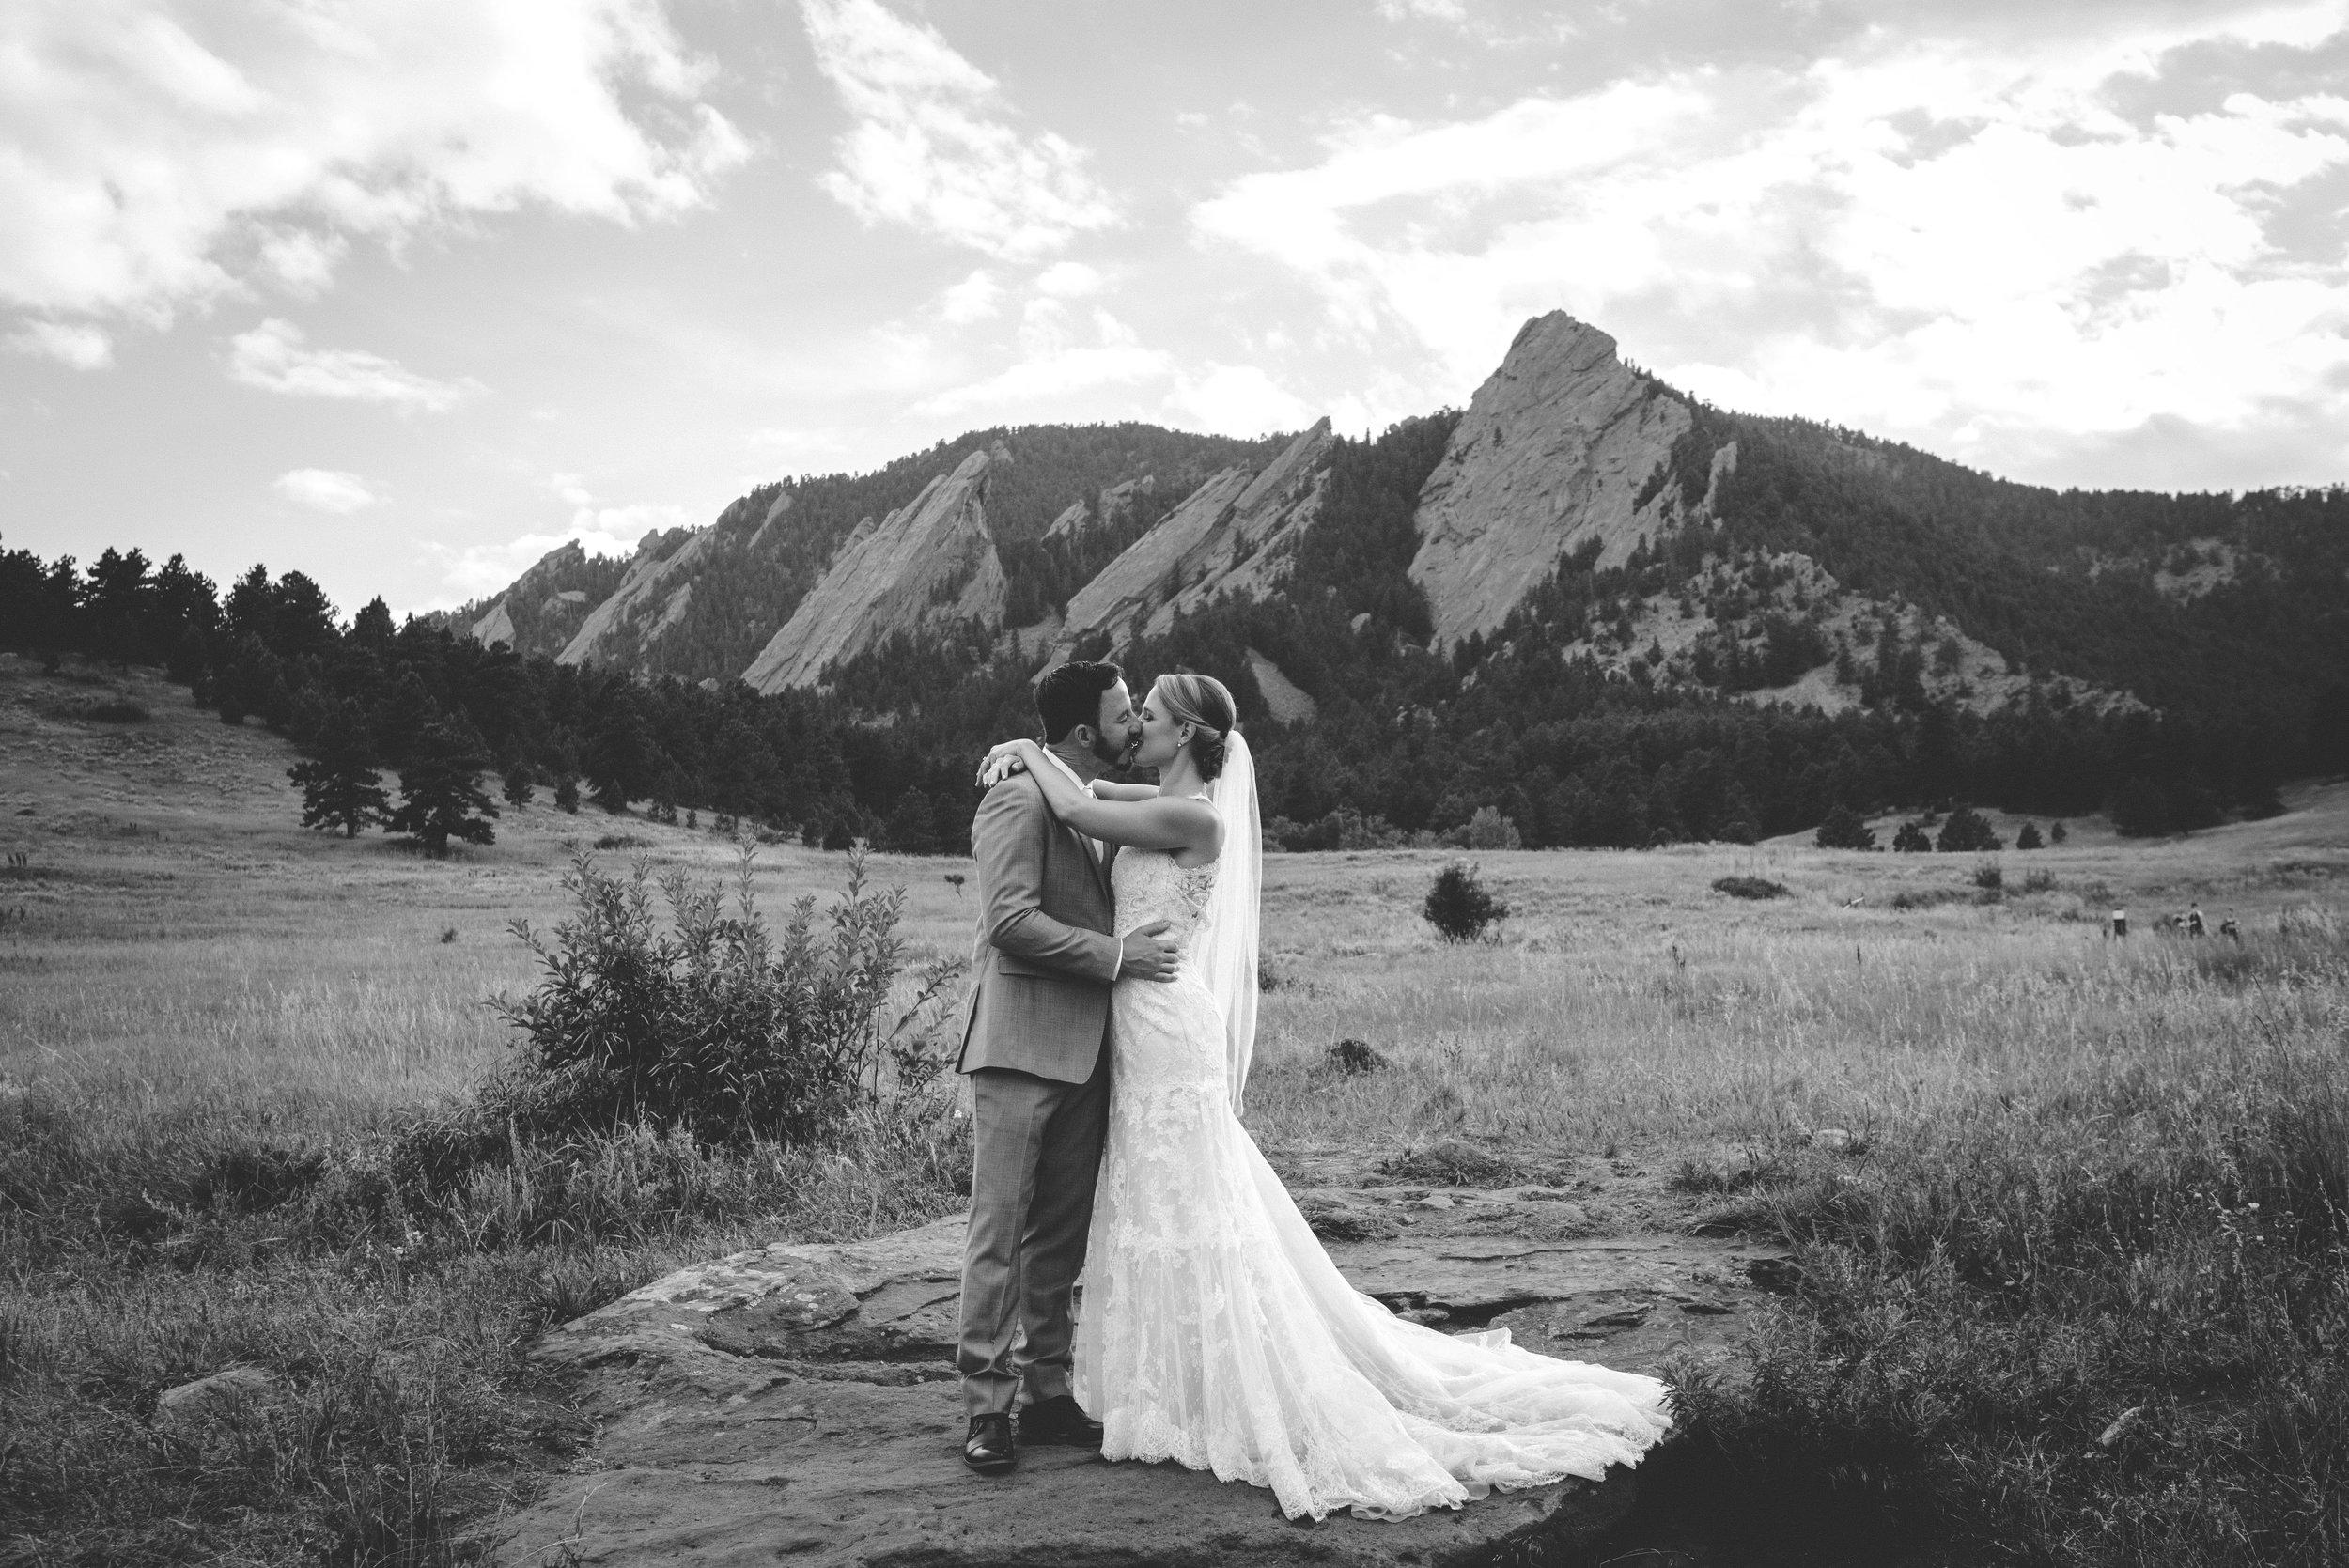 ChadFahnestockPhotography-mc-wedding-017.jpg